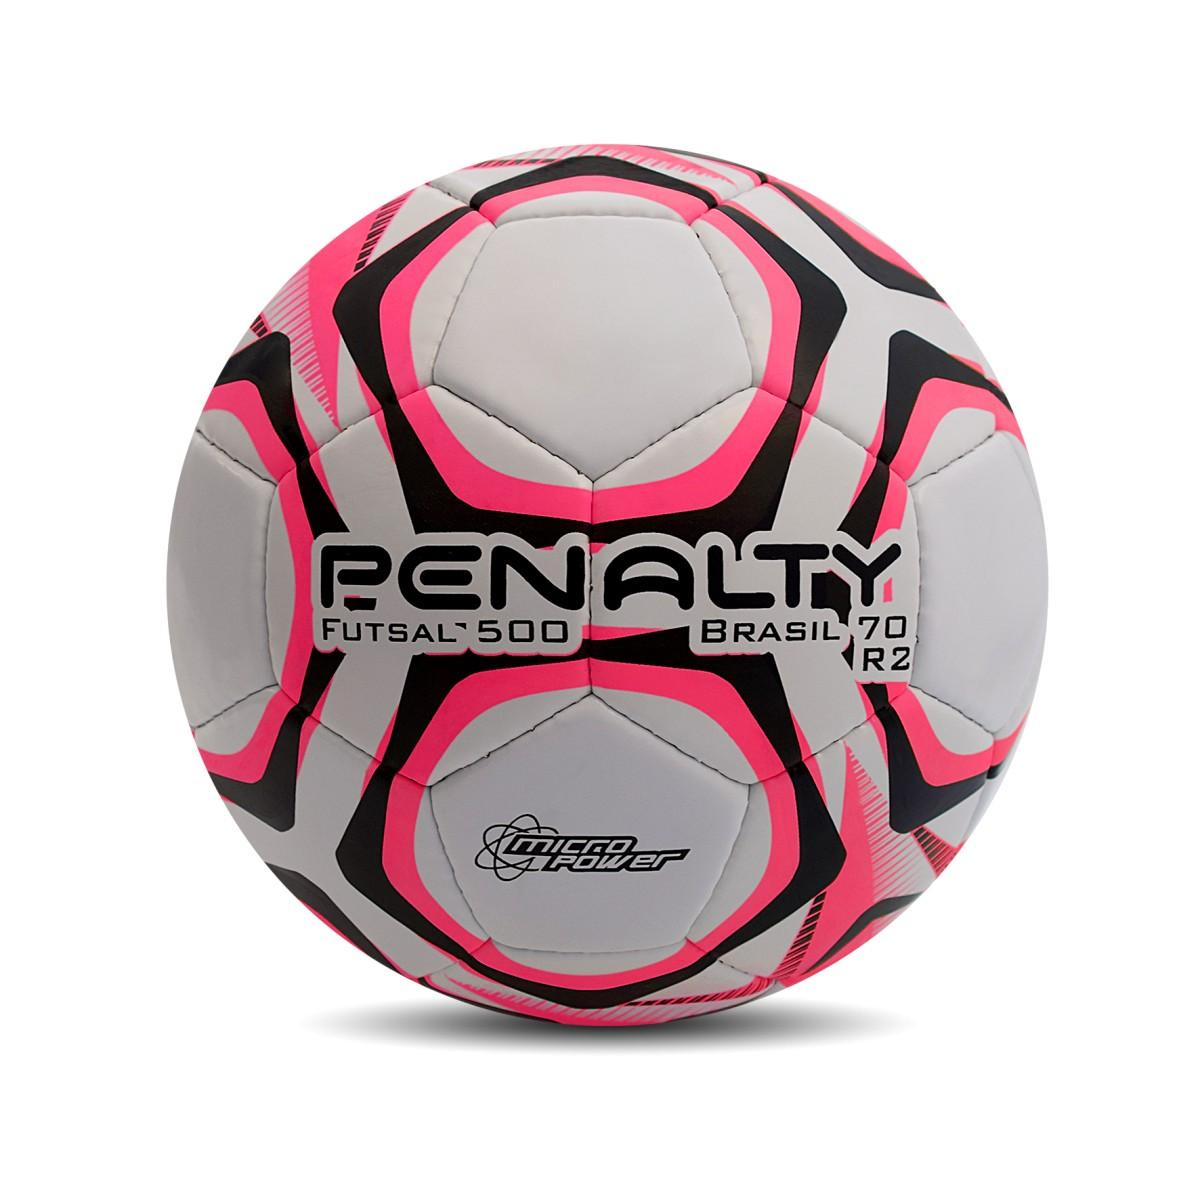 Foto 1 - Bola Penalty Campo Brasil 70 R2 Rosa Original